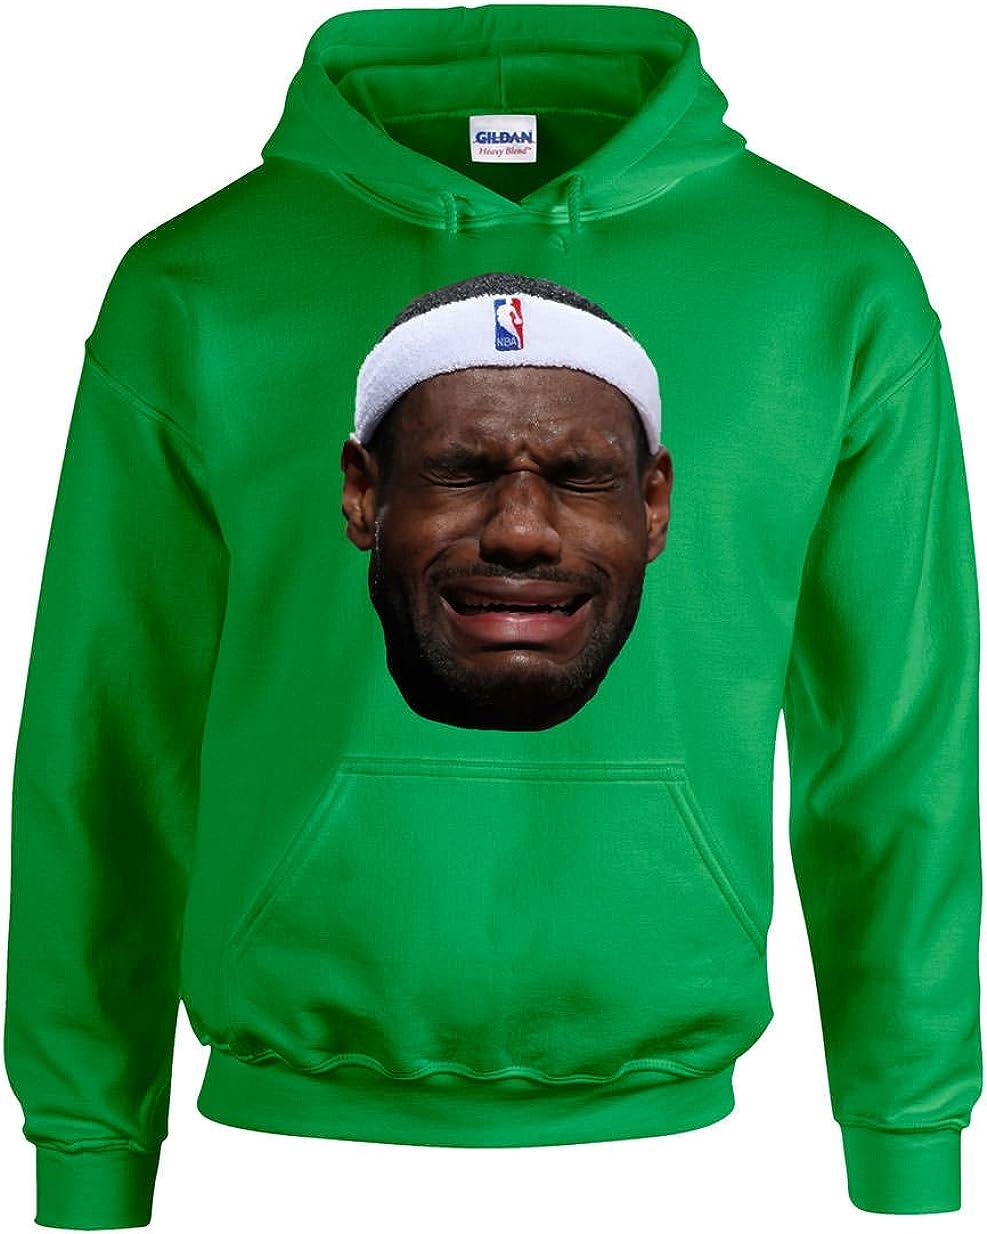 The Tune Guys Green Lebron Crying Face Hooded Sweatshirt